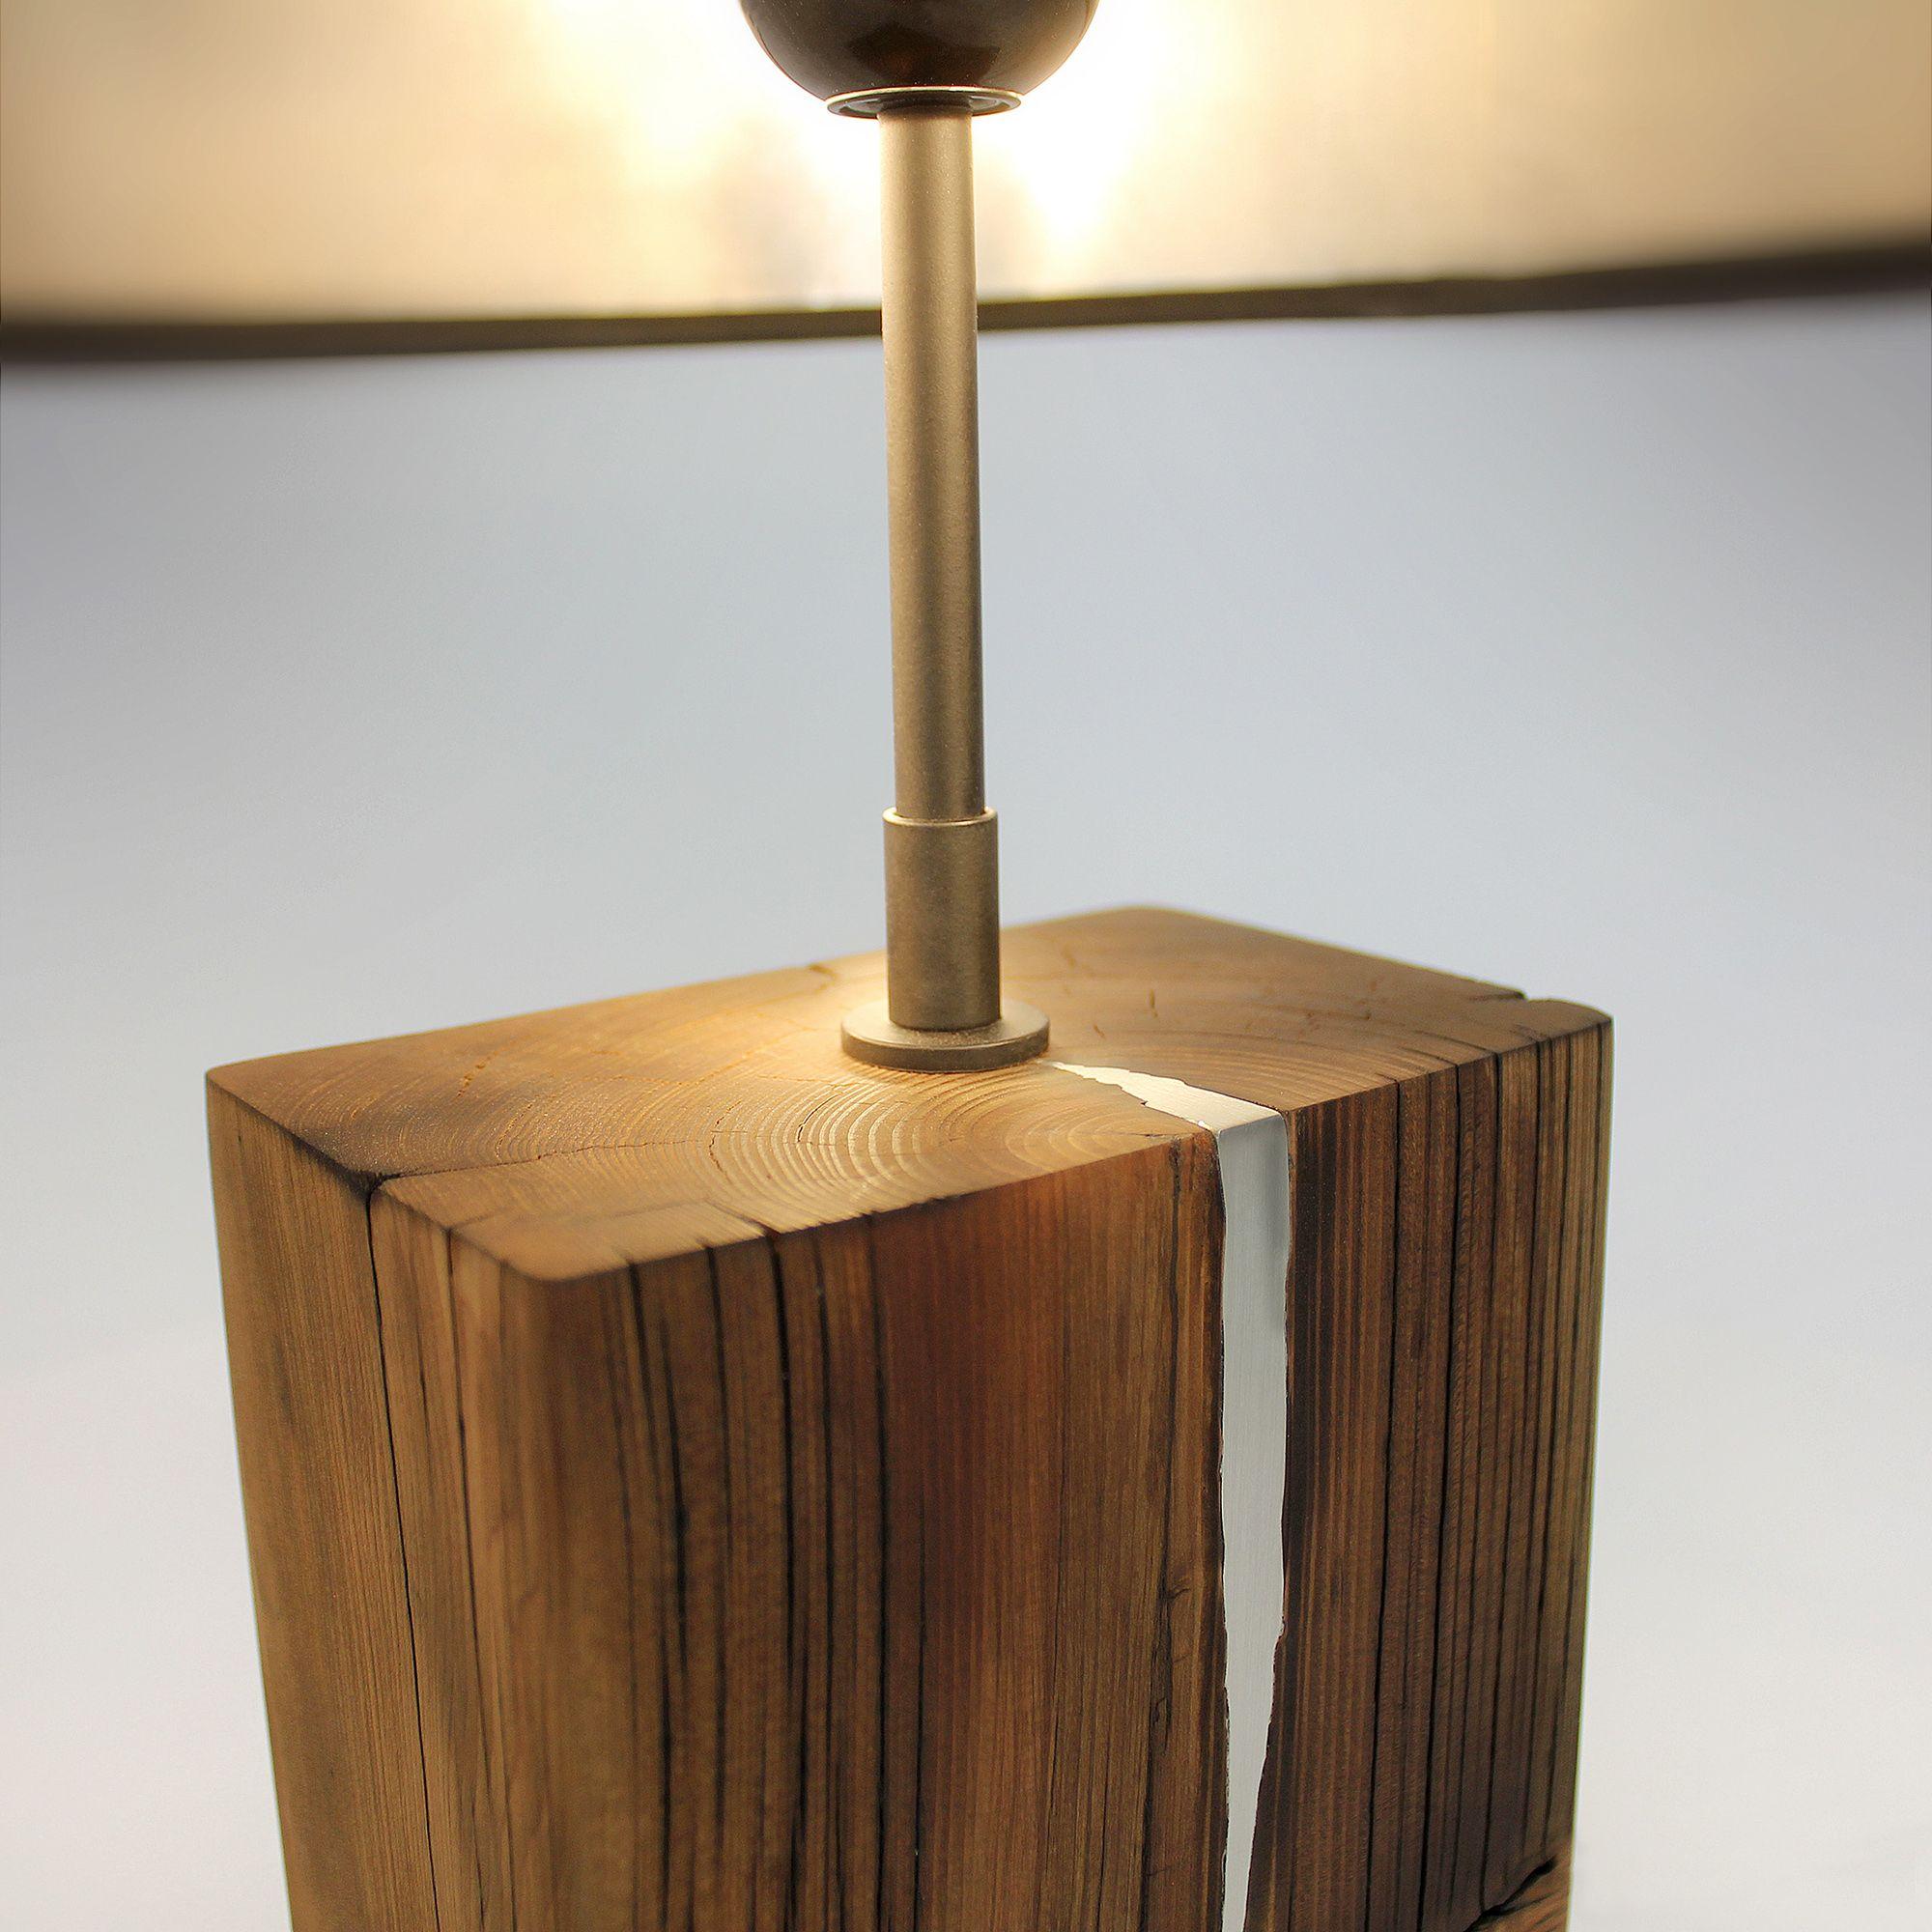 Reclaimed Wood Beam Table Lamp Metal Inlay Touch Base Custom Etsy In 2021 Reclaimed Wood Beams Table Lamp Wood Black Lampshade Distressed wood table lamp